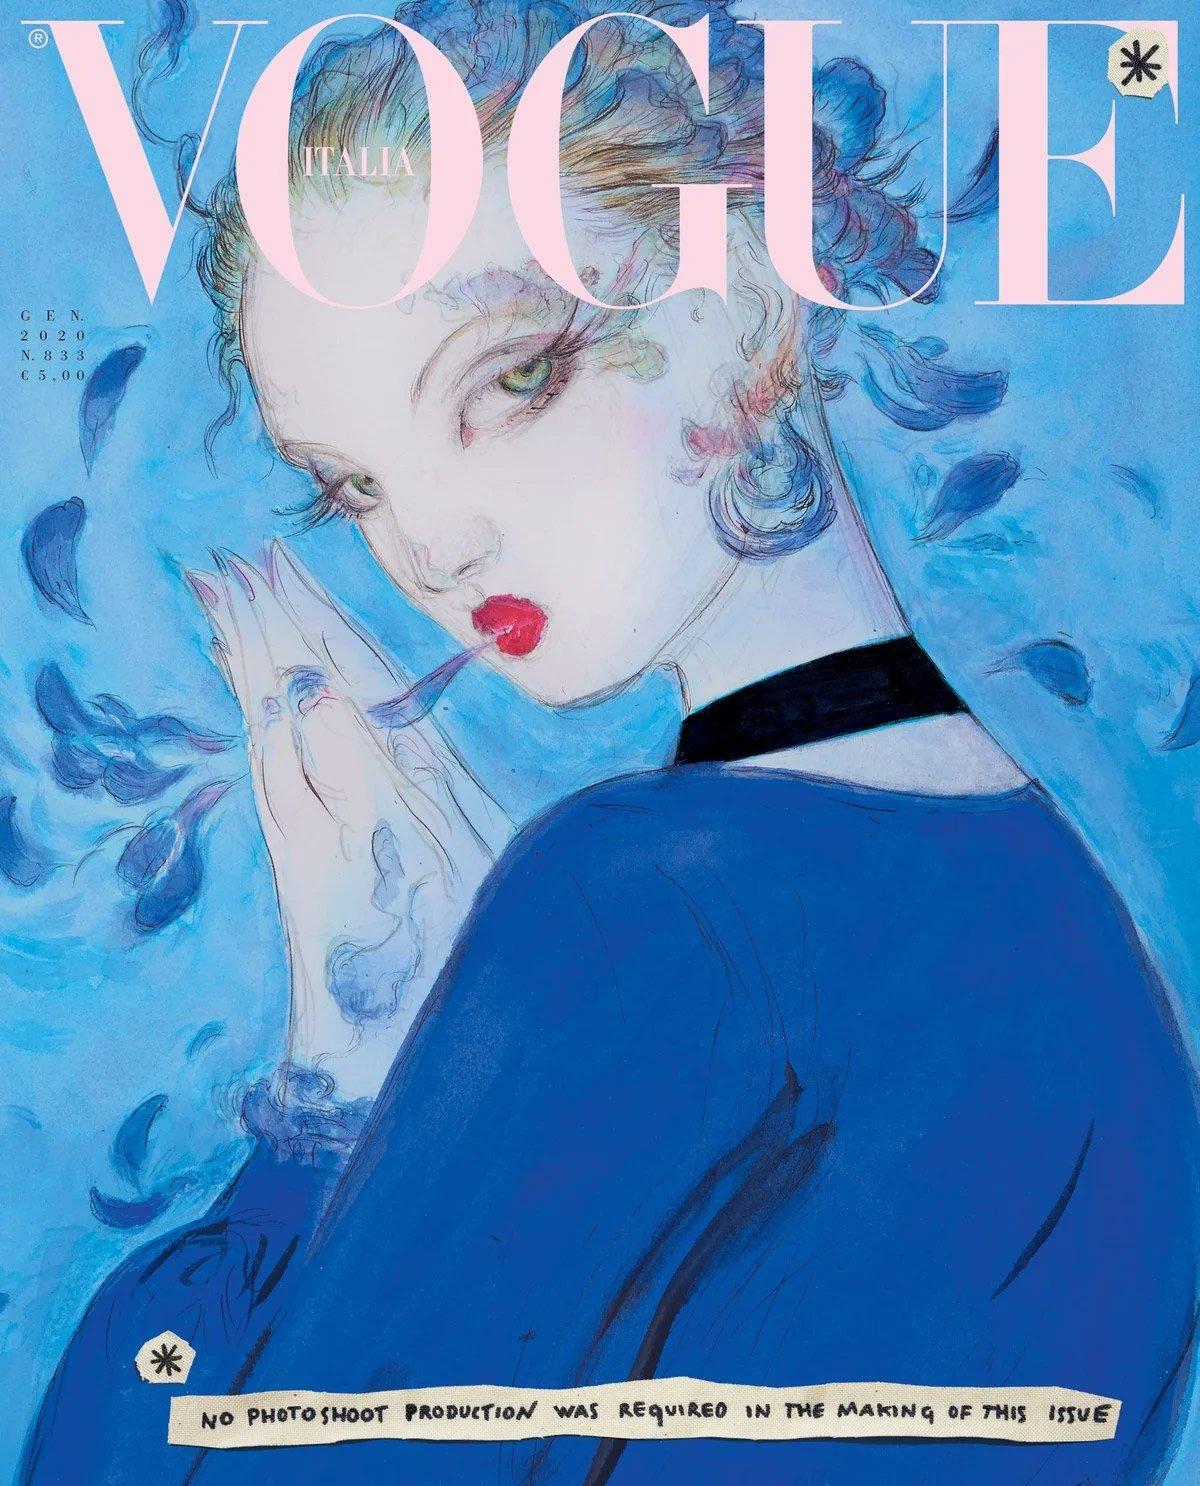 Yoshitaka Amano's cover for Vogue Italia